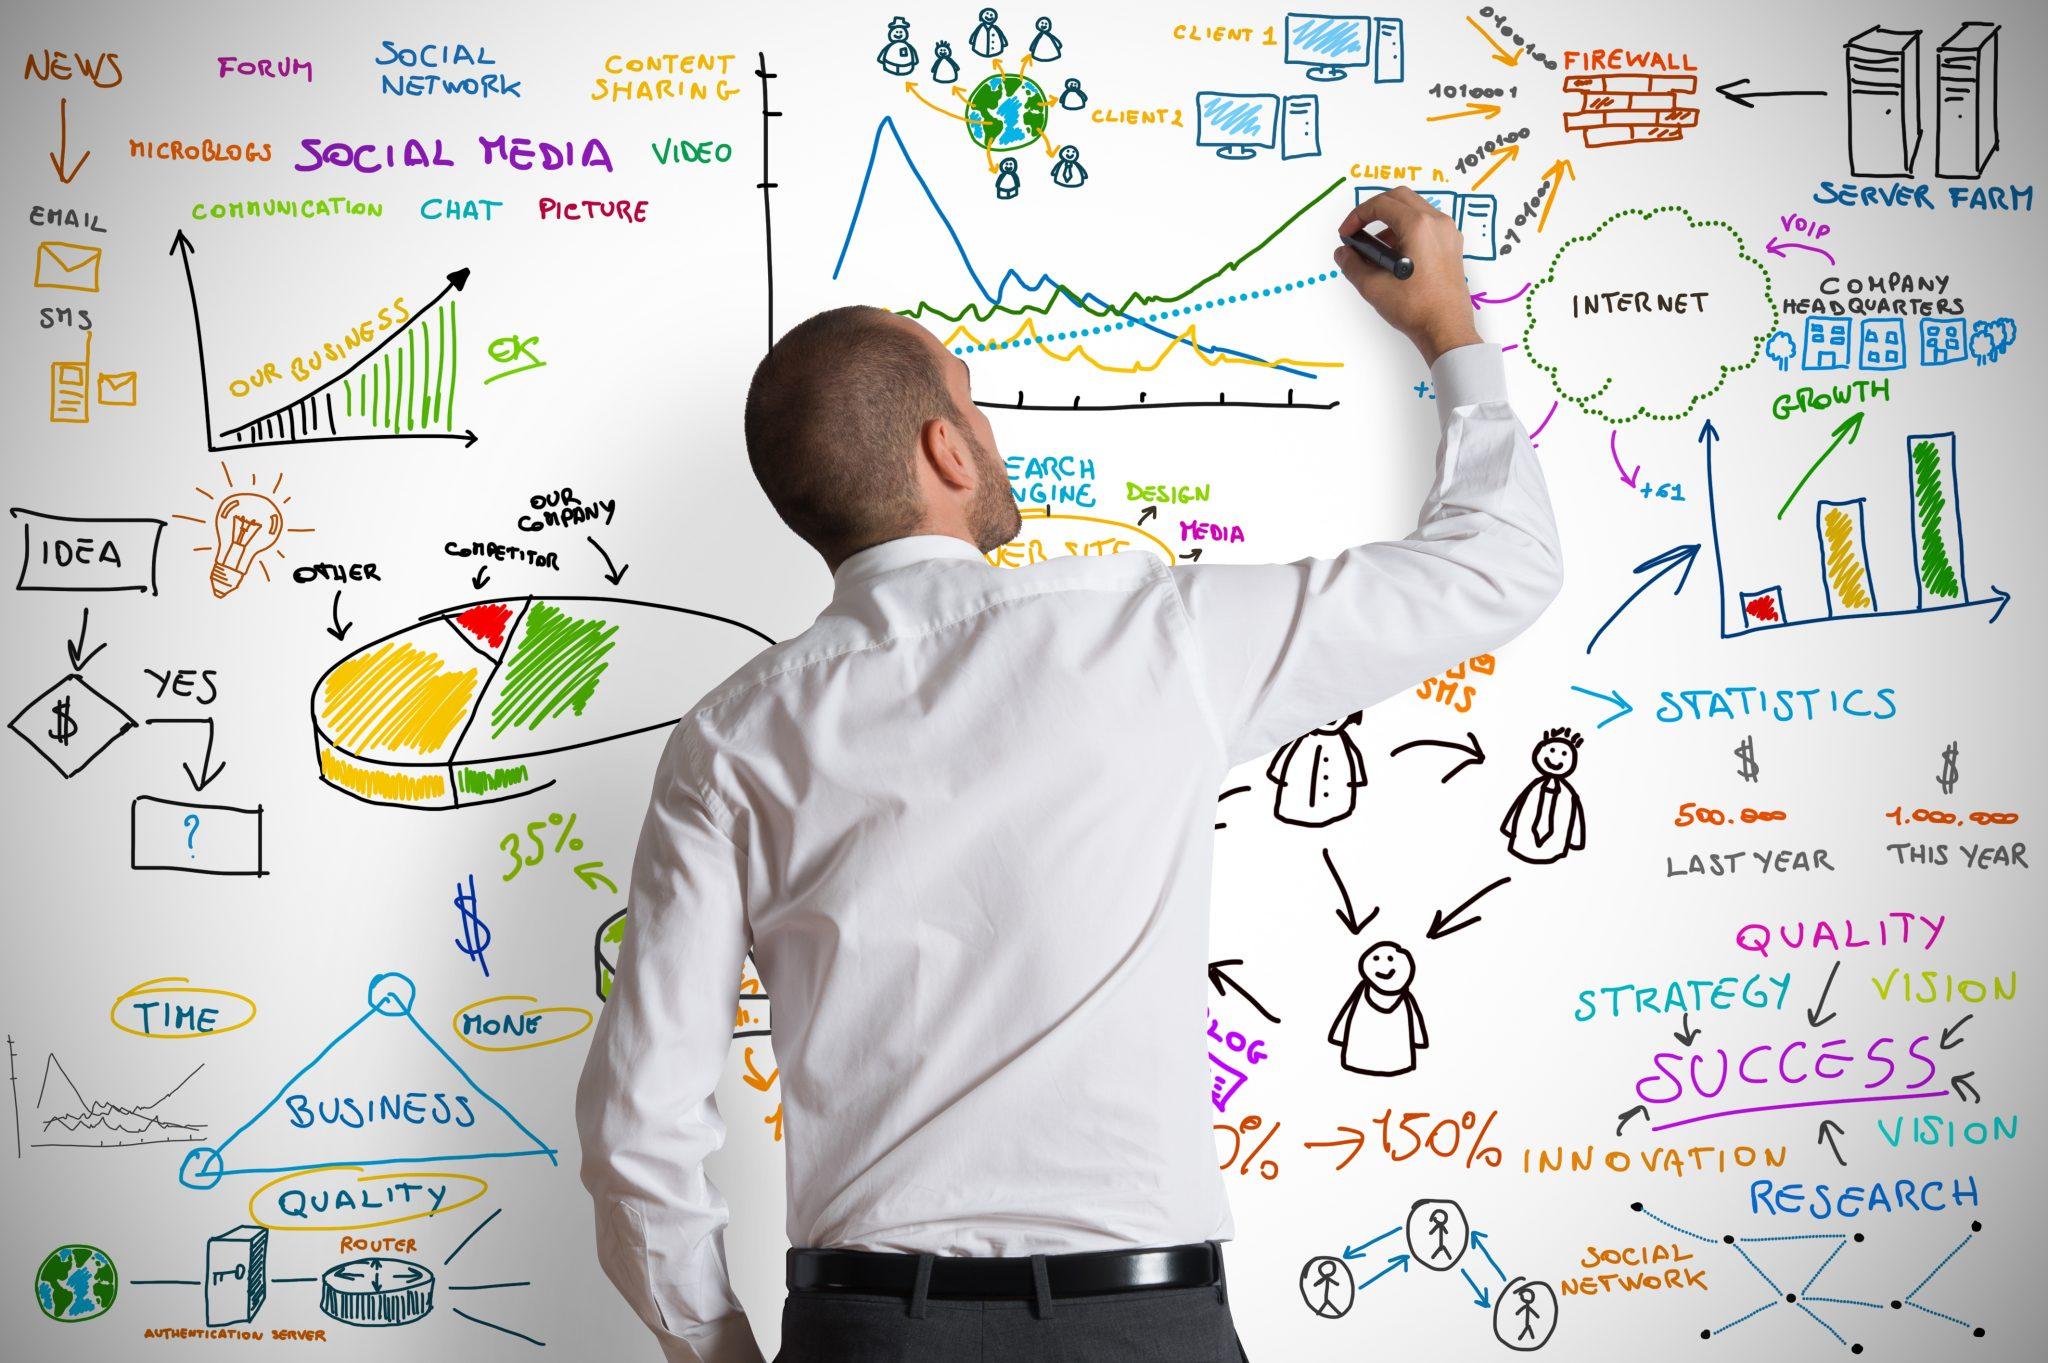 Brand Management Beyond Web Design